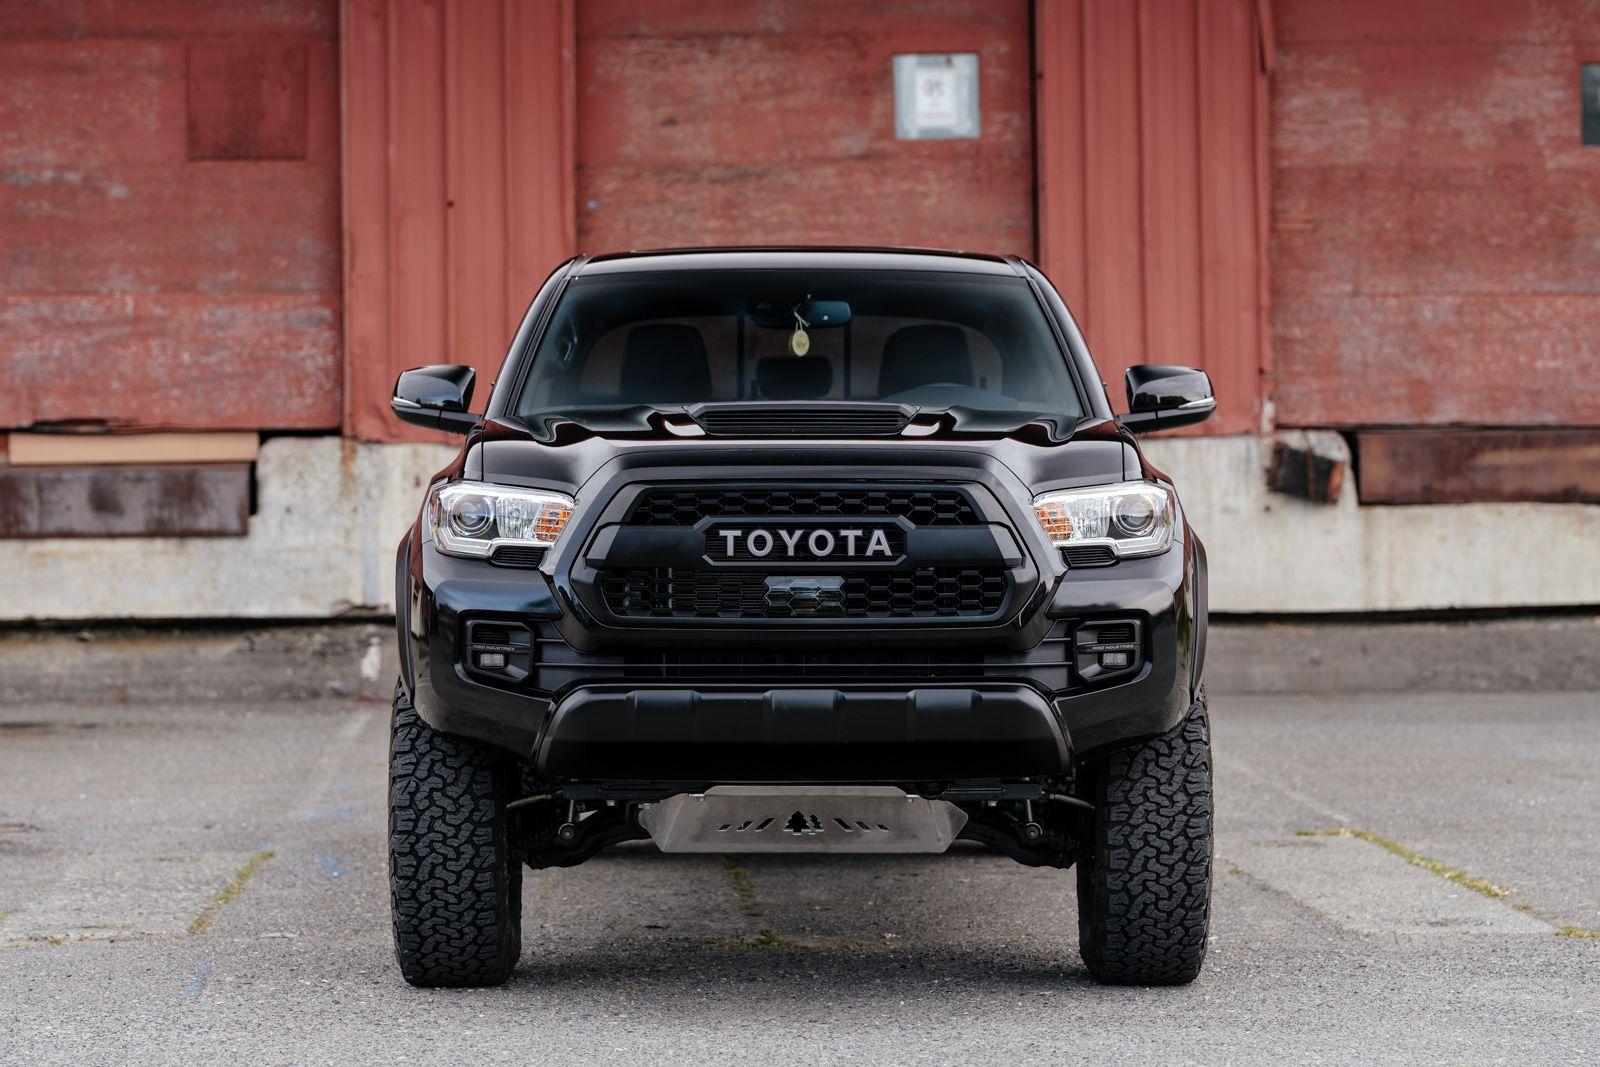 2018 Toyota Tacoma Trd Sport Custom Silver Arrow Cars Ltd Toyota Tacoma Trd Sport Toyota Tacoma Tacoma Trd